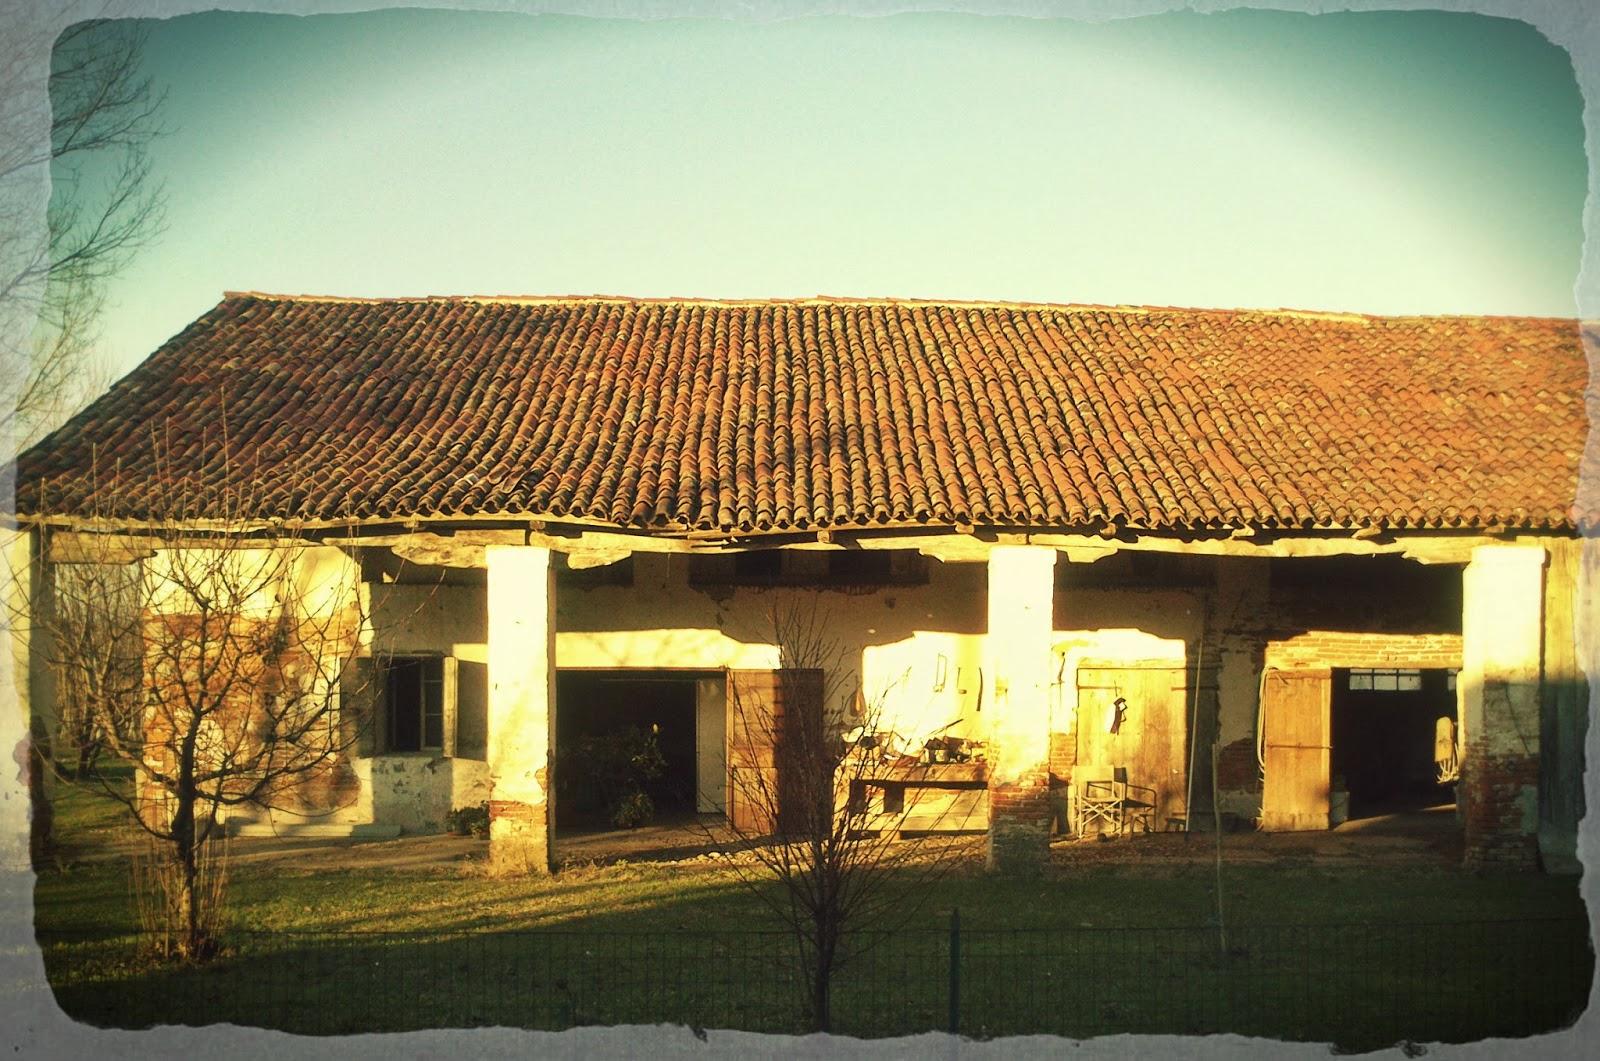 Una casa da pensare - Casa ammobiliata ...